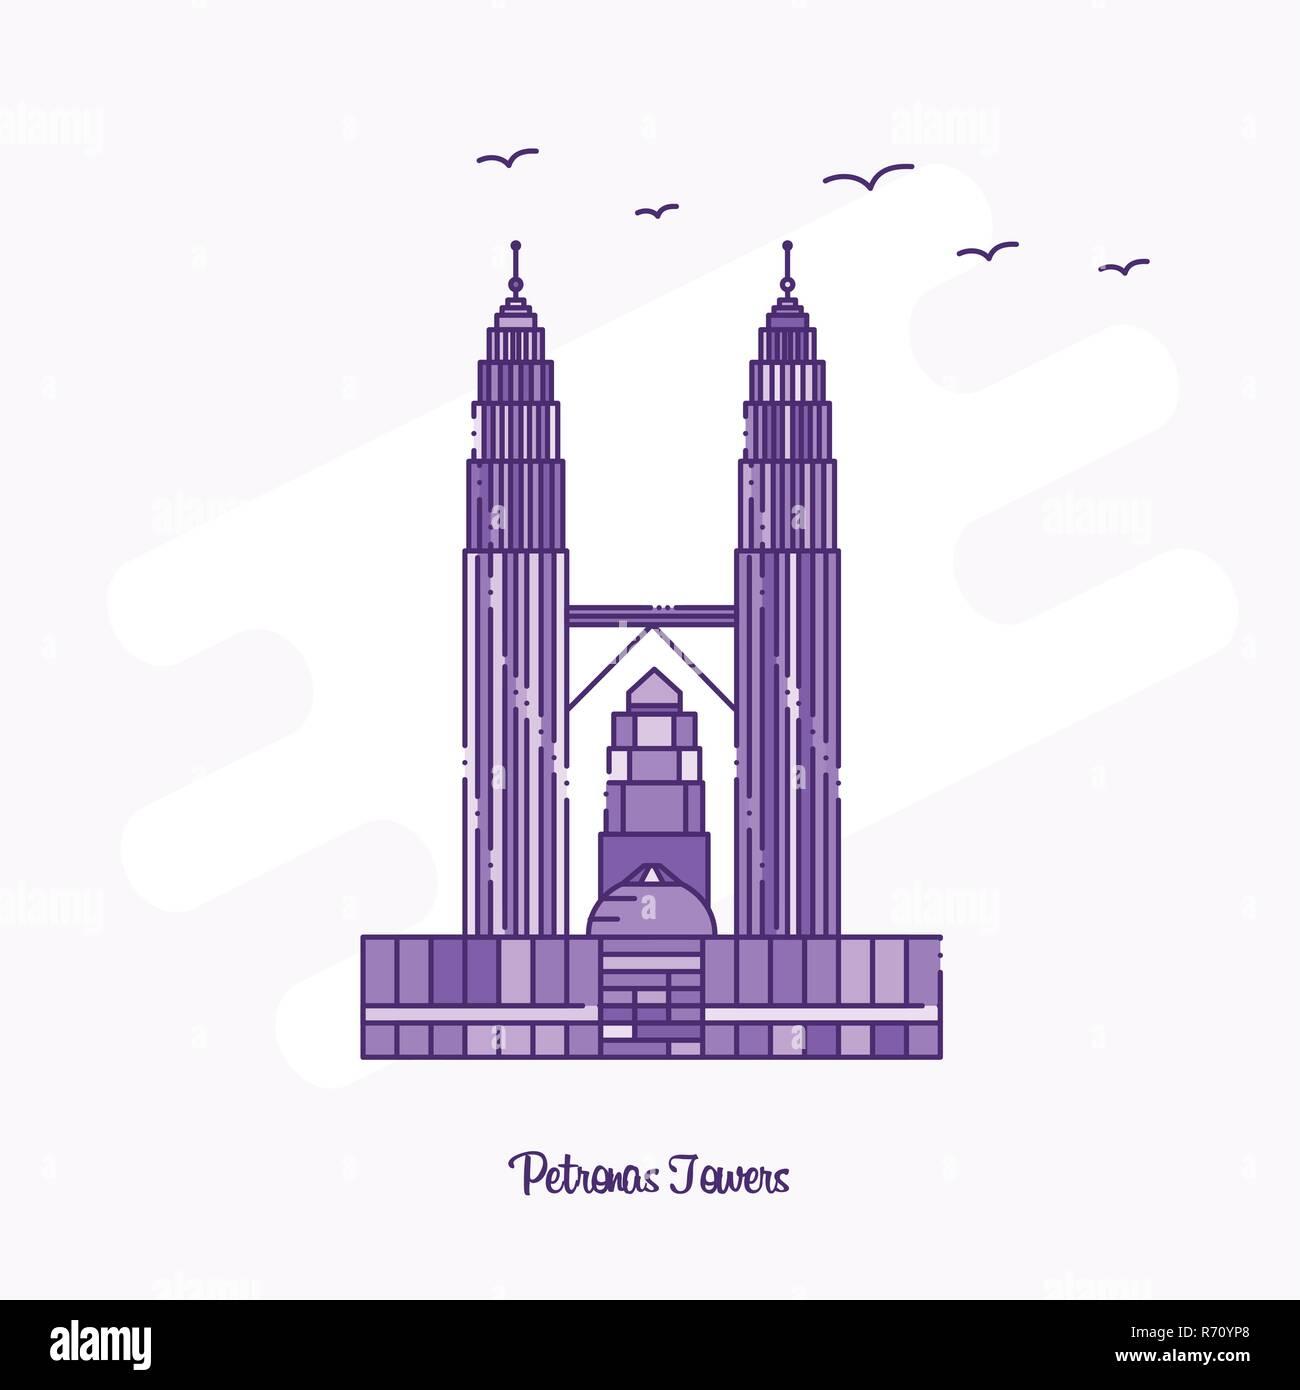 PETRONAS TOWERS Landmark Purple Dotted Line skyline vector illustration - Stock Vector